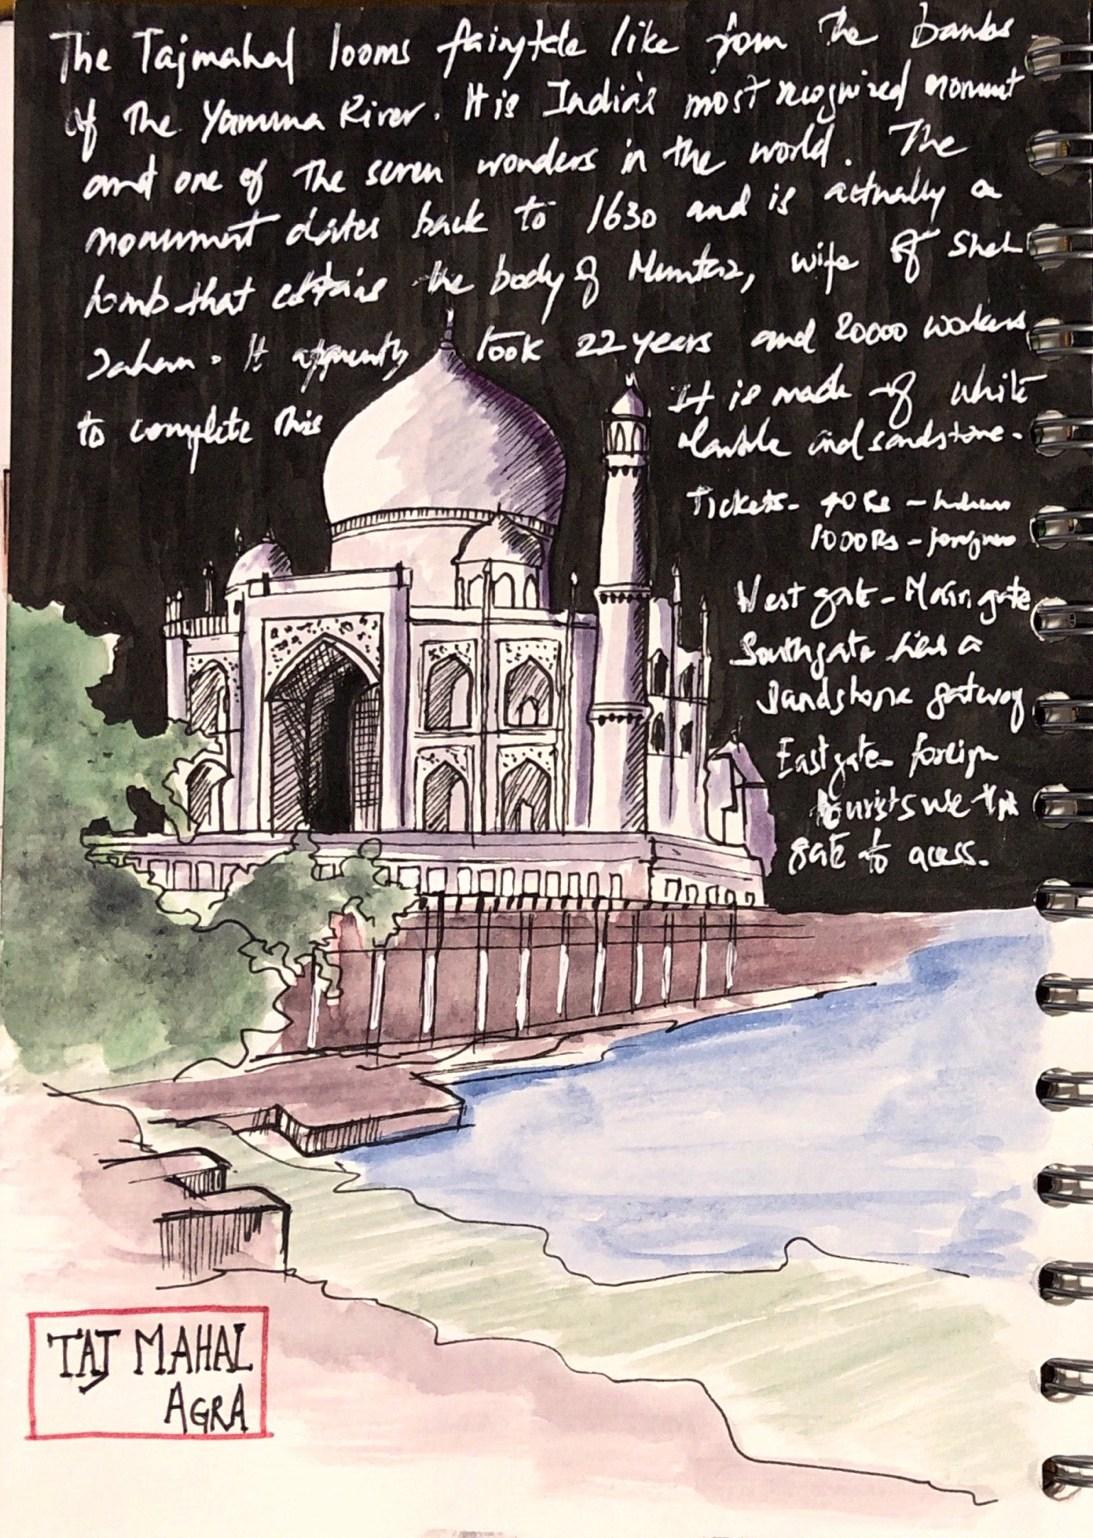 Taj-mahal-agra-sketch-sooraj.jpg